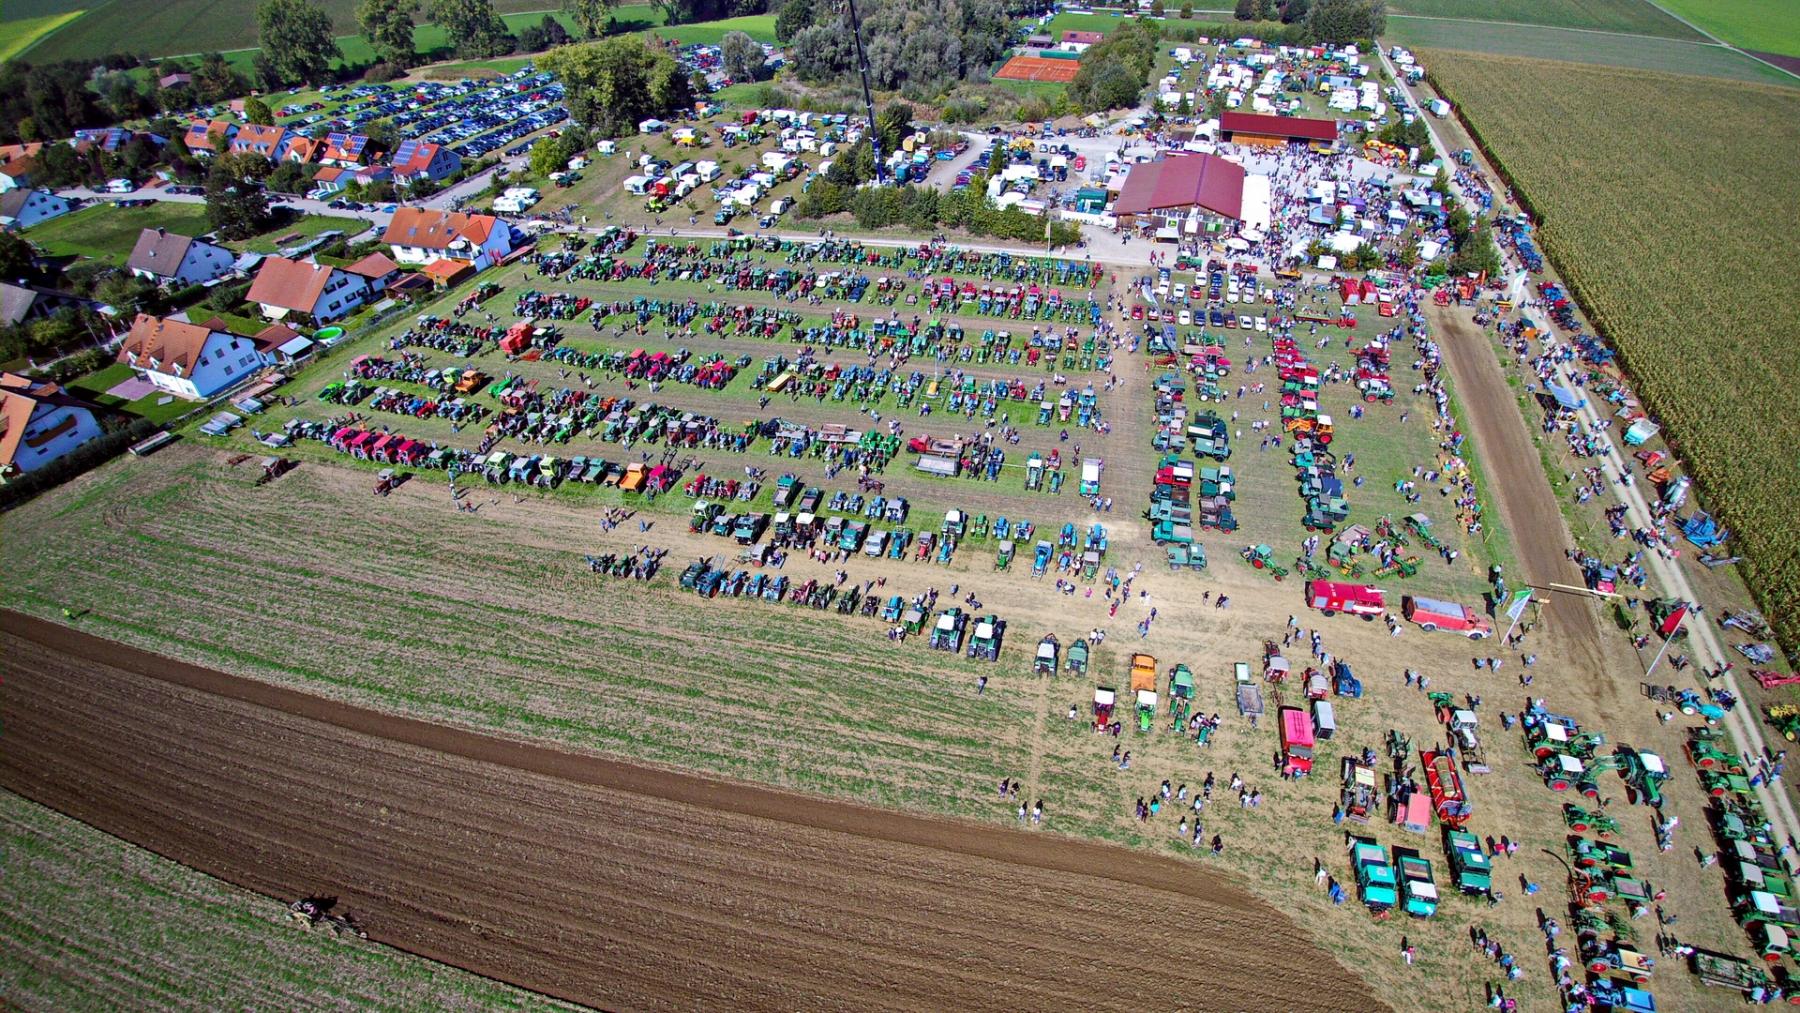 2018_09_14-16 Schleppertreffen Schmiechen  1155